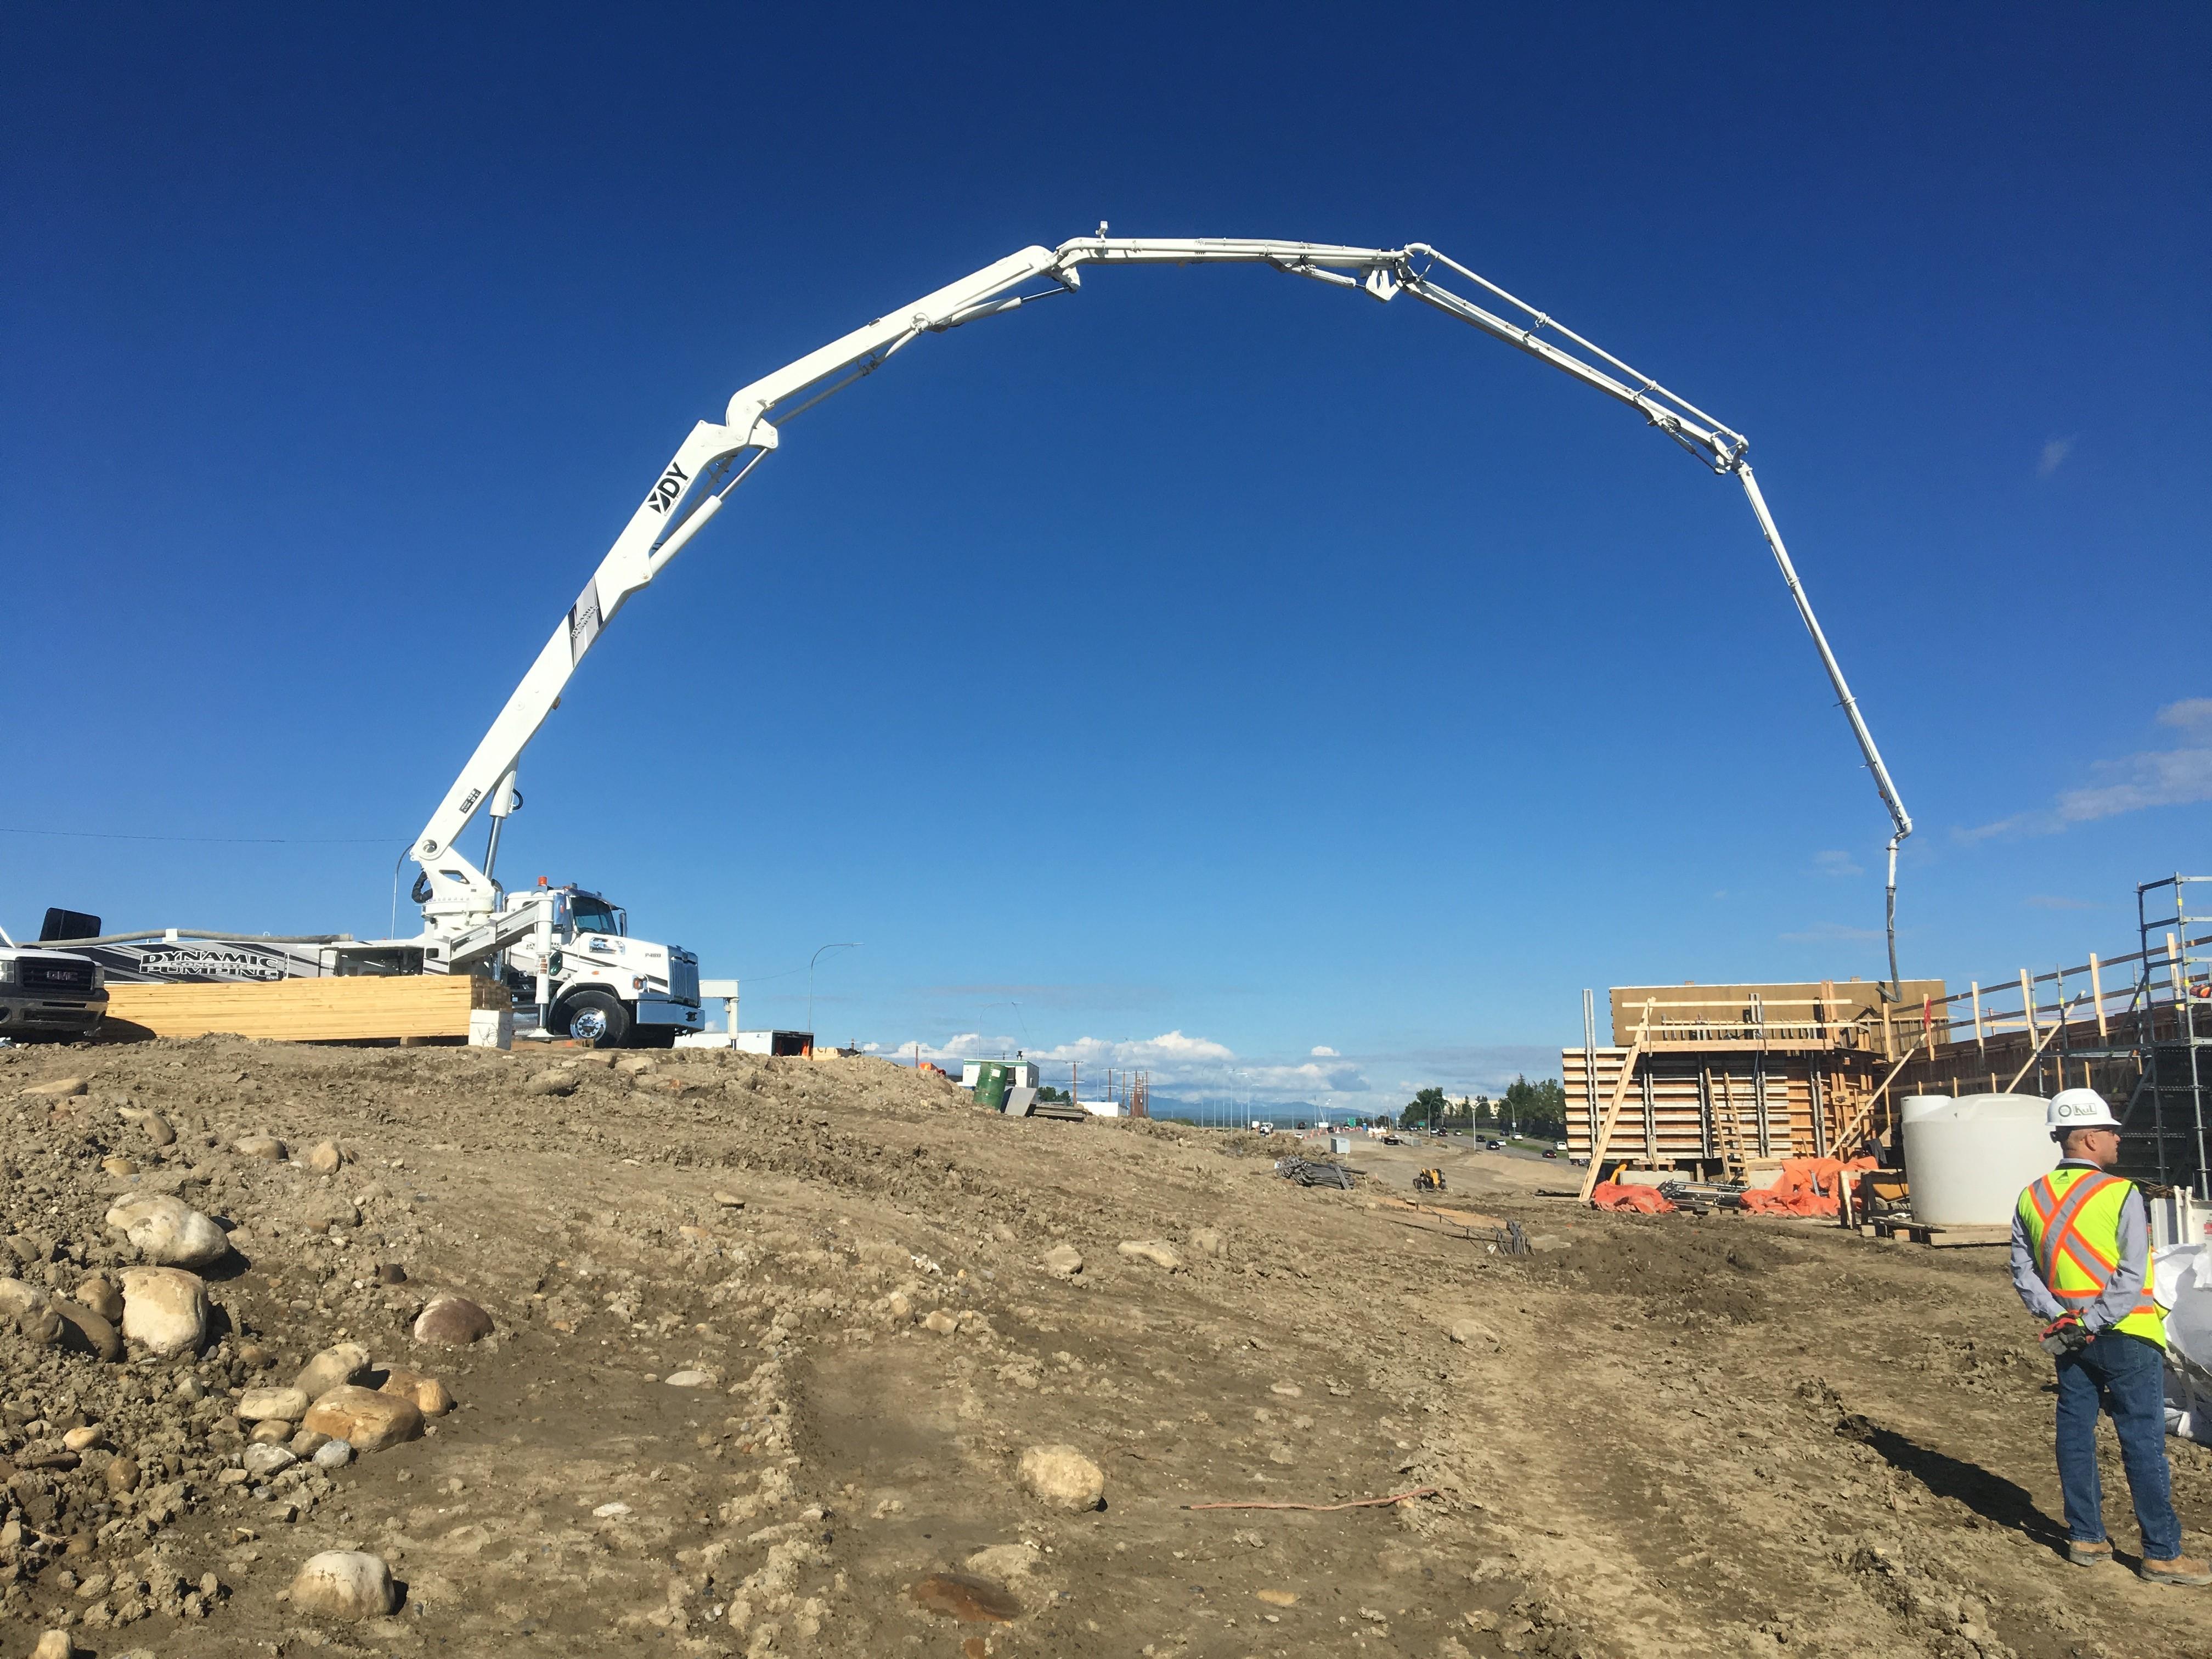 Dynamic Concrete Pumping utilizing their 48-M concrete boom pump